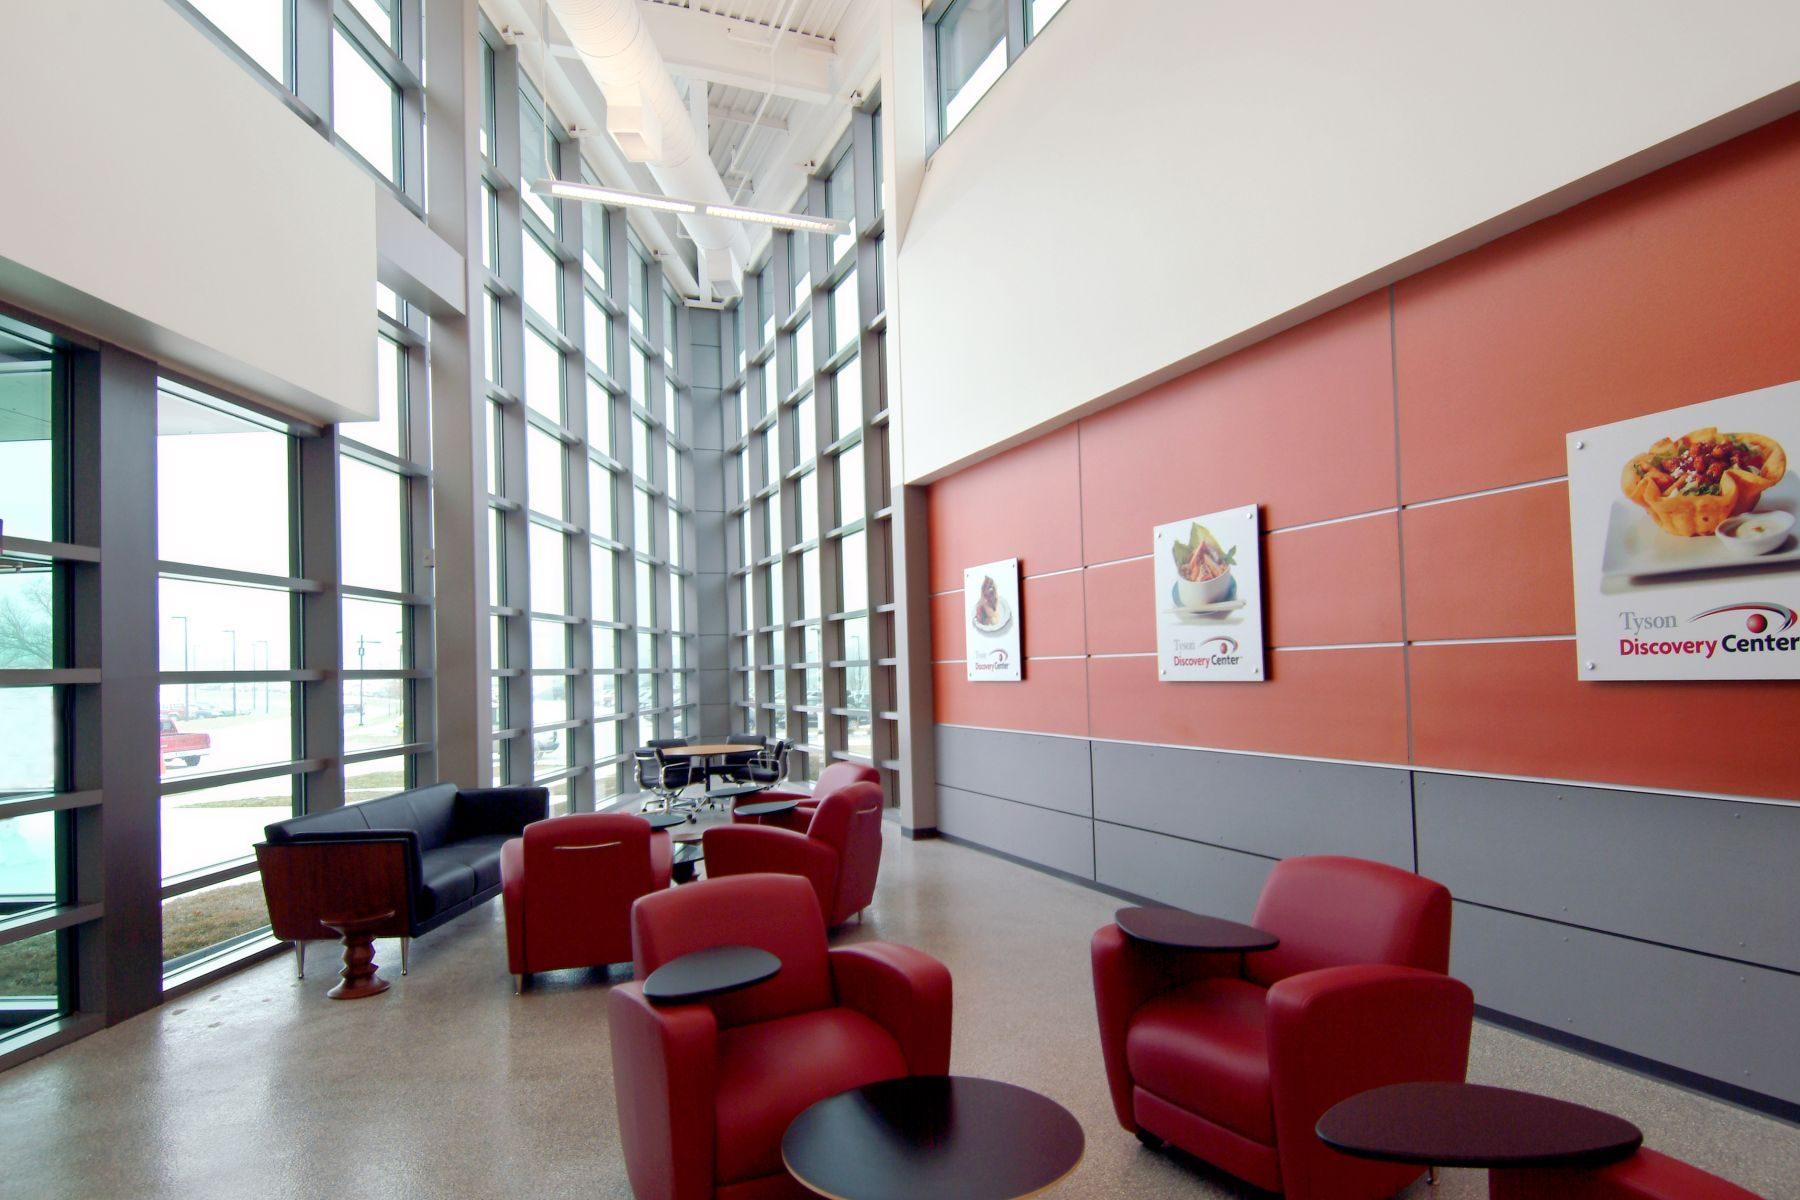 Tyson Discovery Center Lobby